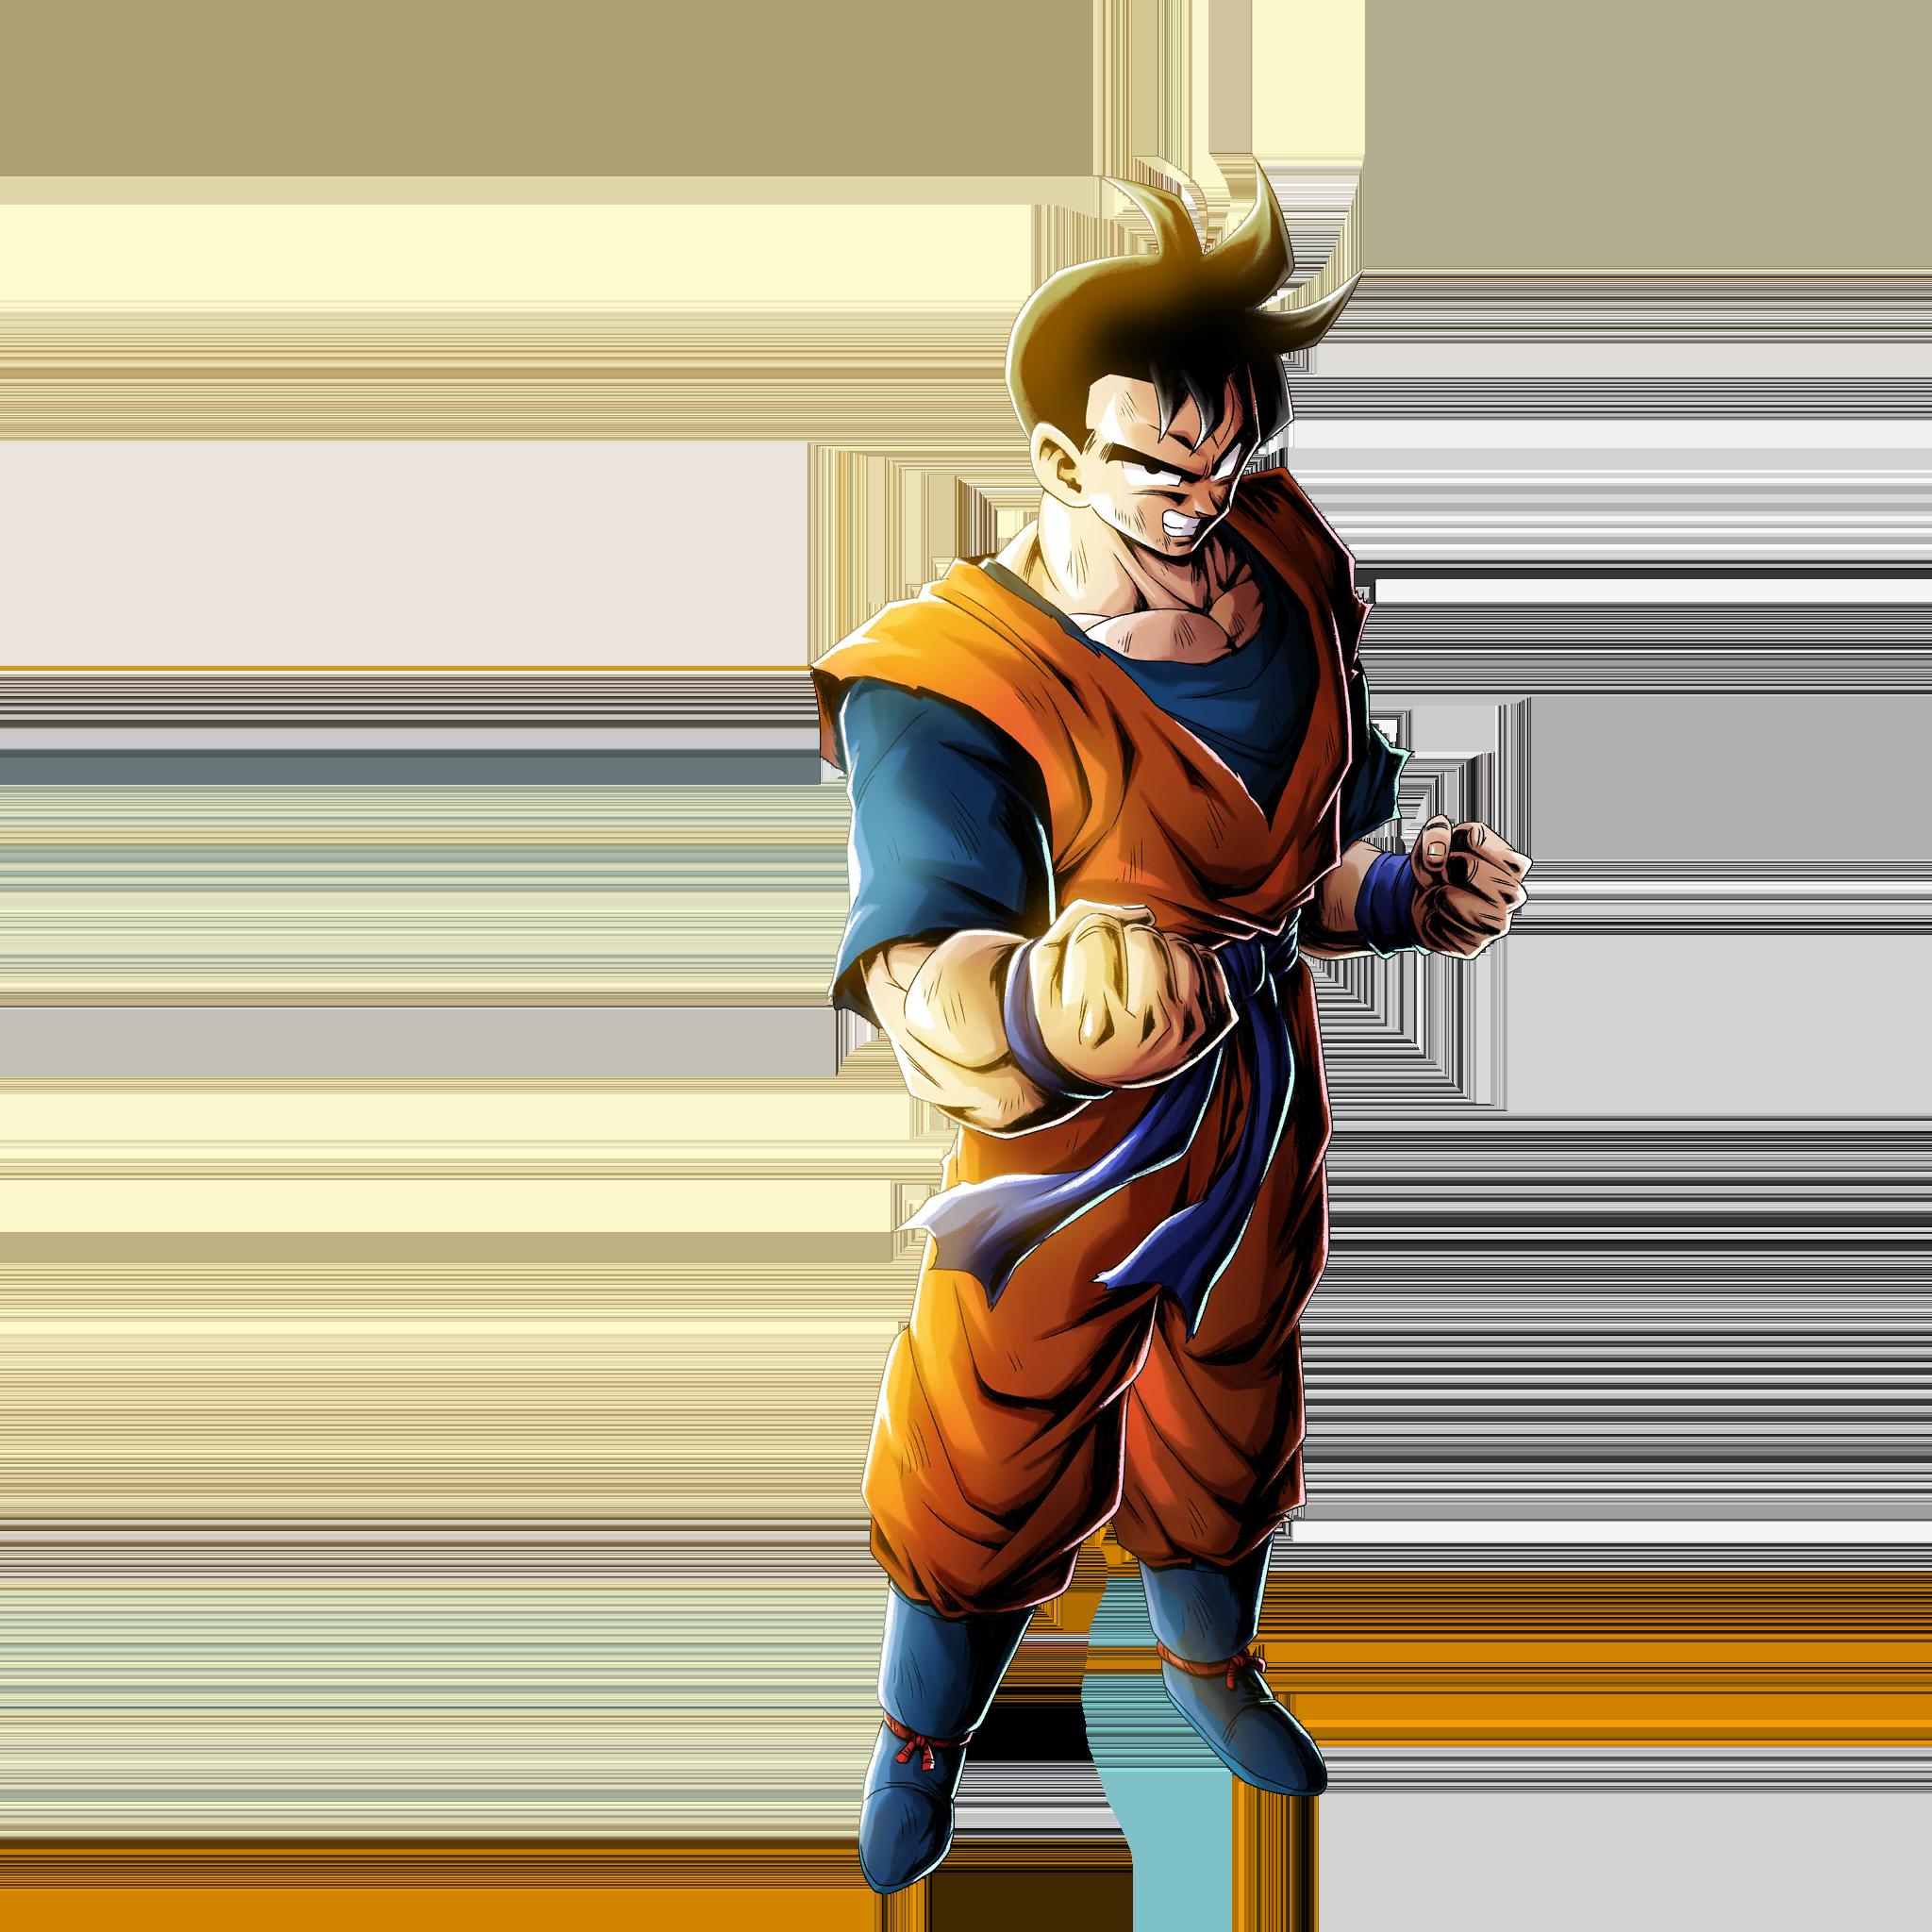 Future Gohan render [DB Legends] by maxiuchiha22 on DeviantArt#deviantart #future #gohan #legends #maxiuchiha22 #render